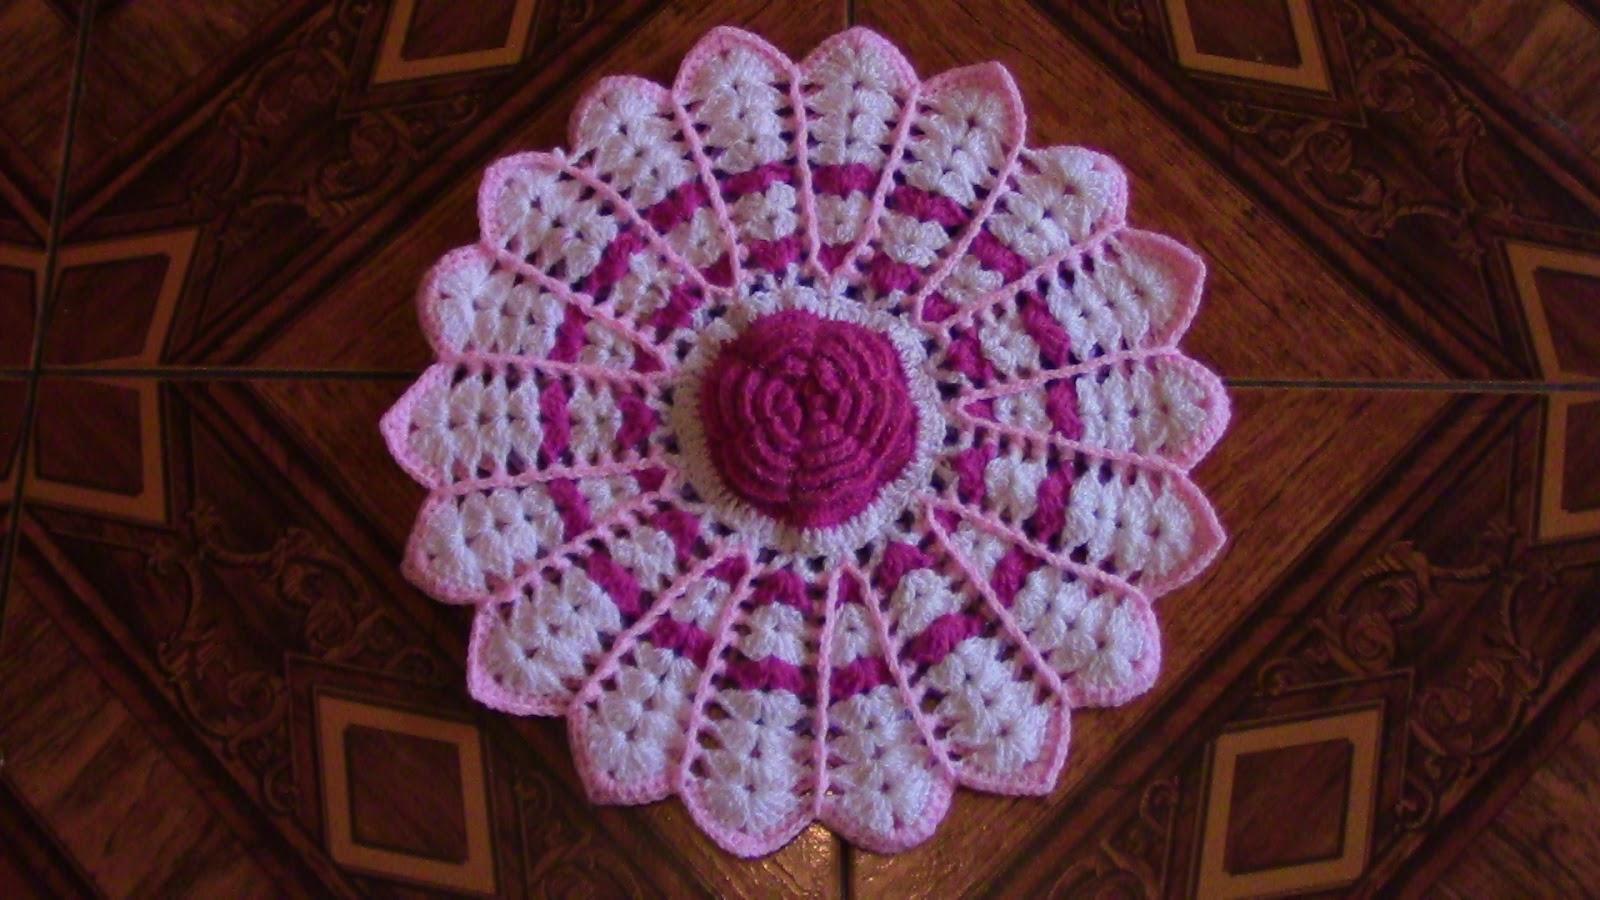 Tejidos olga huaman tapetes tejidos a crochet para sillas y muebles tejidos olga huaman - Tejidos para tapizar sillas ...